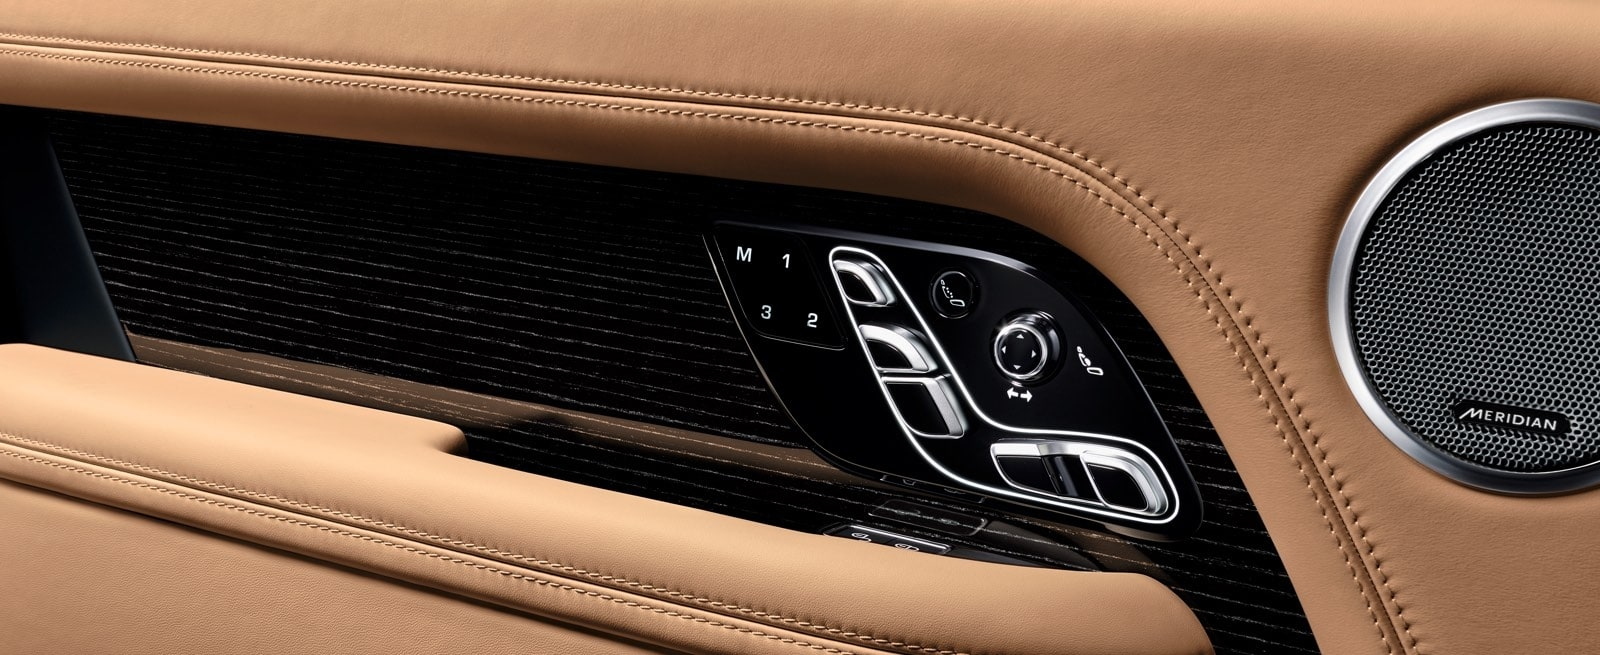 Range Rover Interior Seat Adjustment Controls